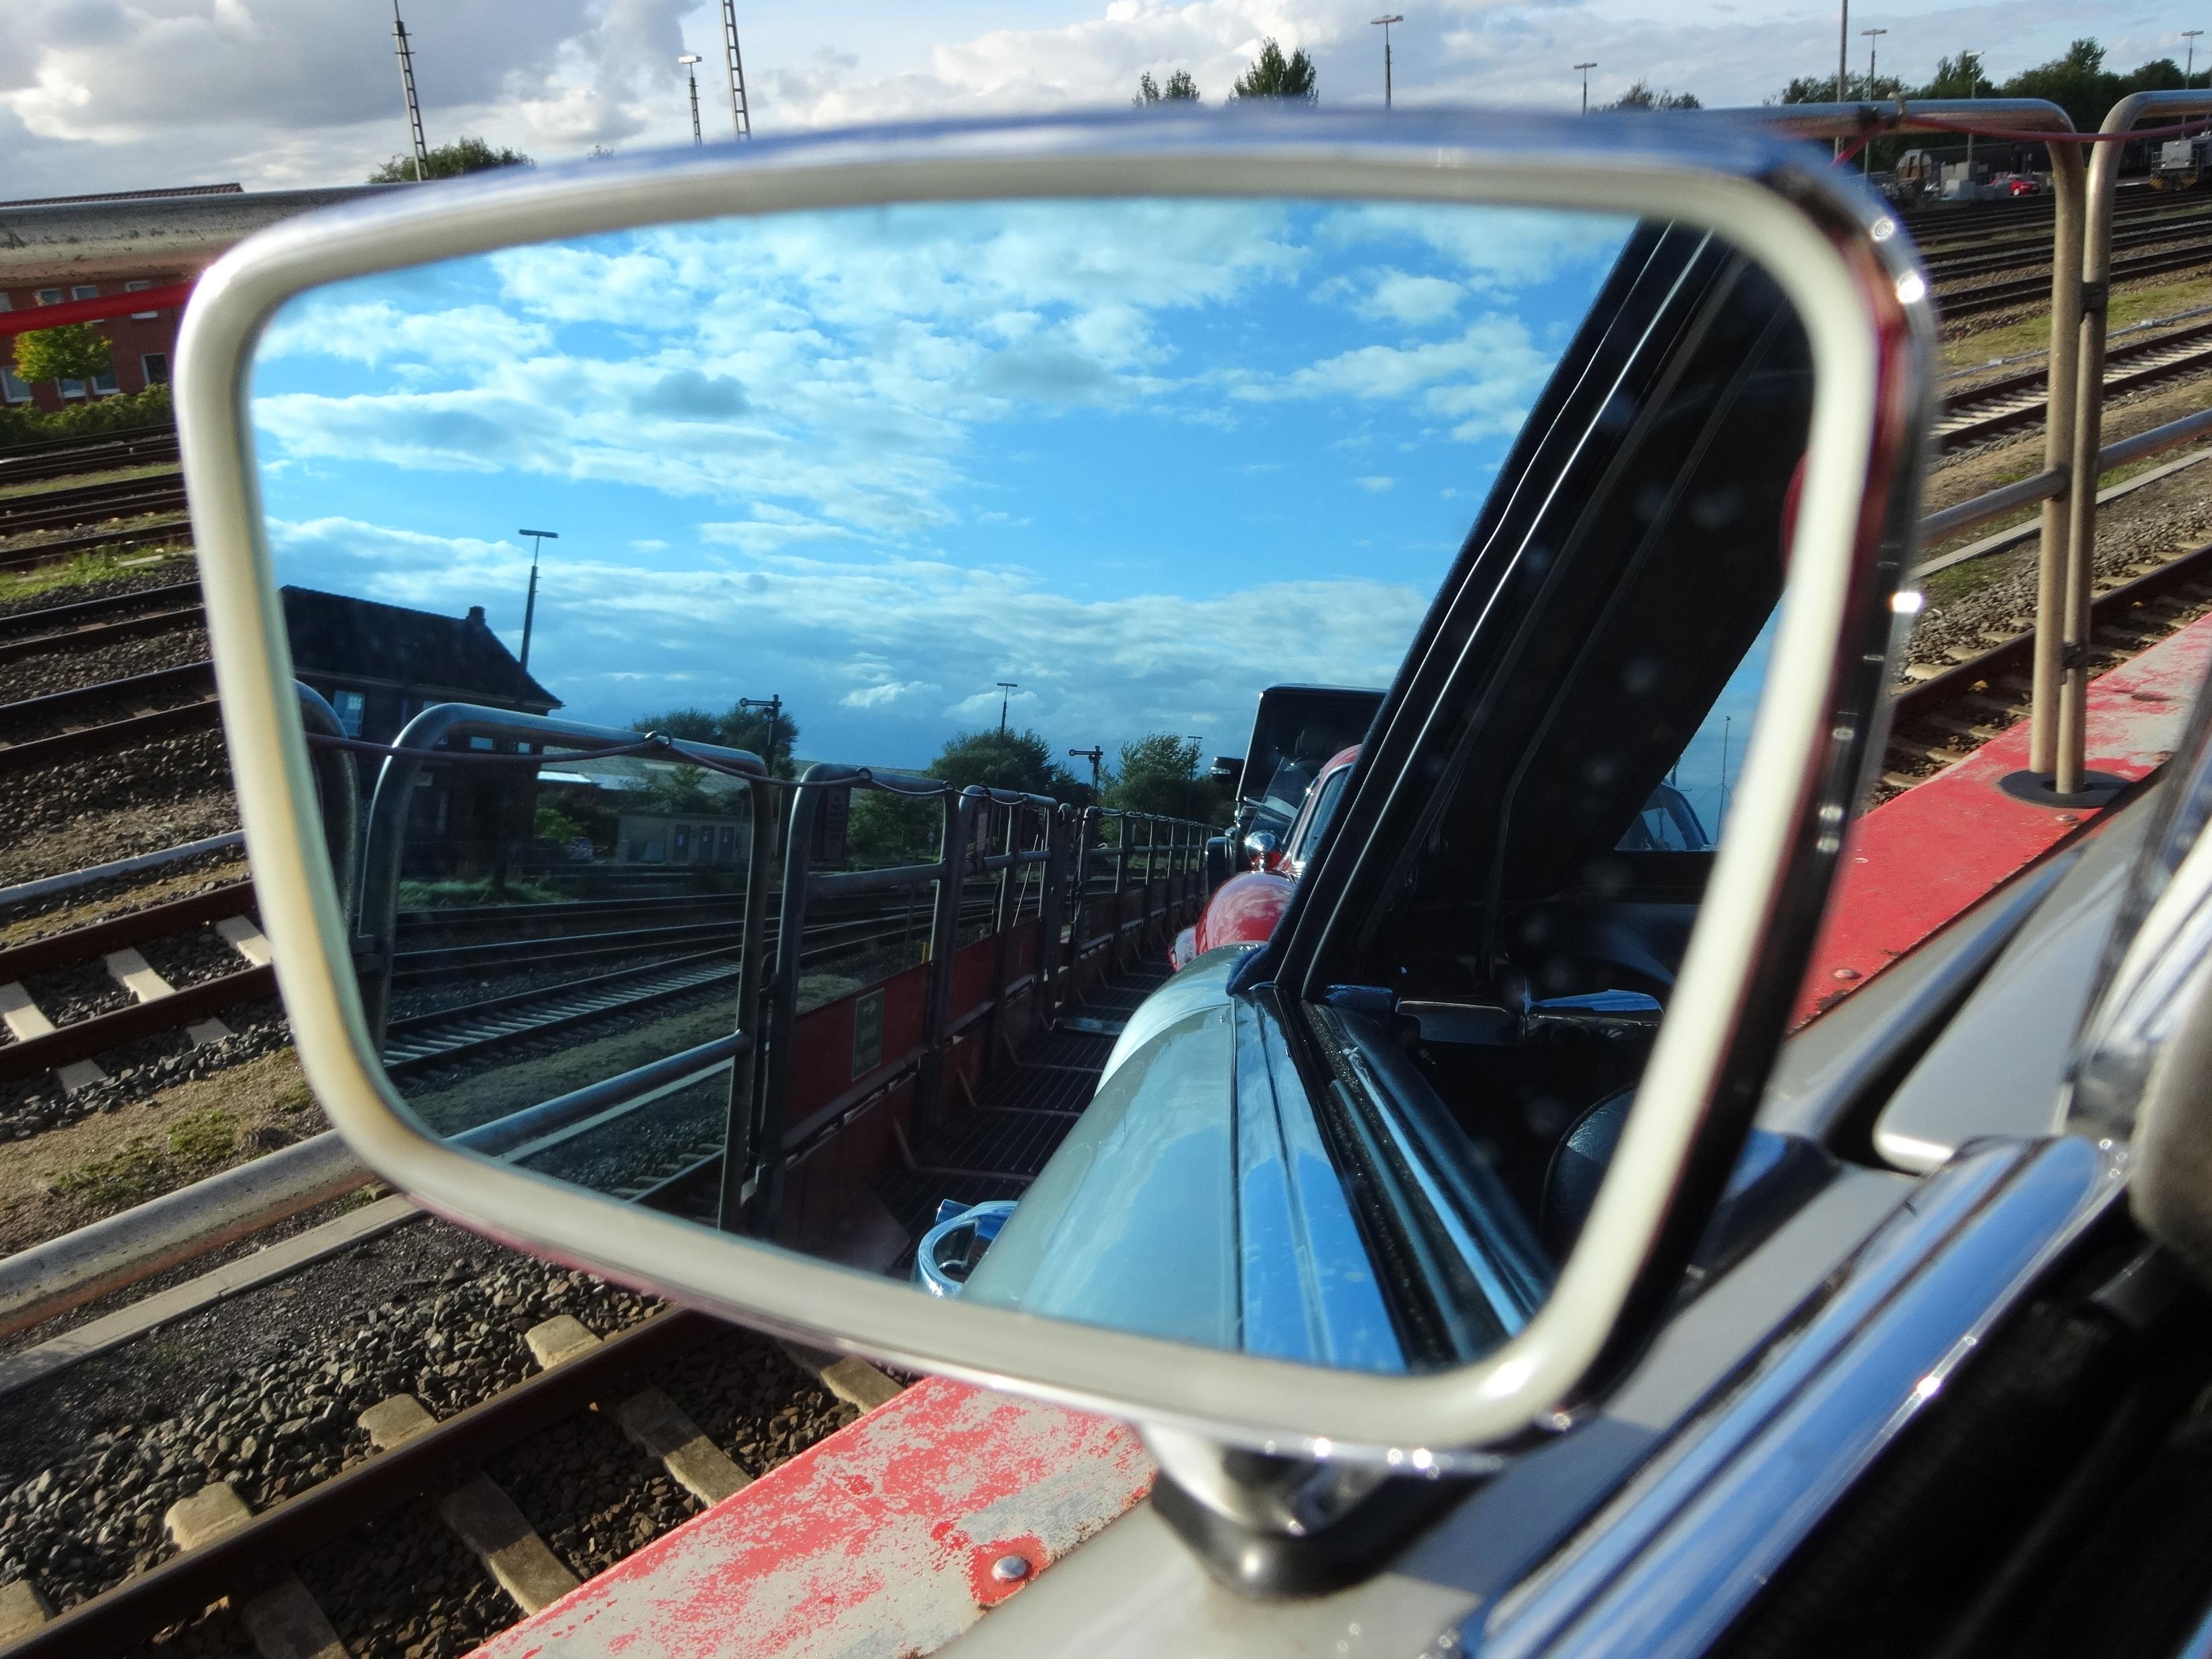 Rückspiegel / rear view mirror